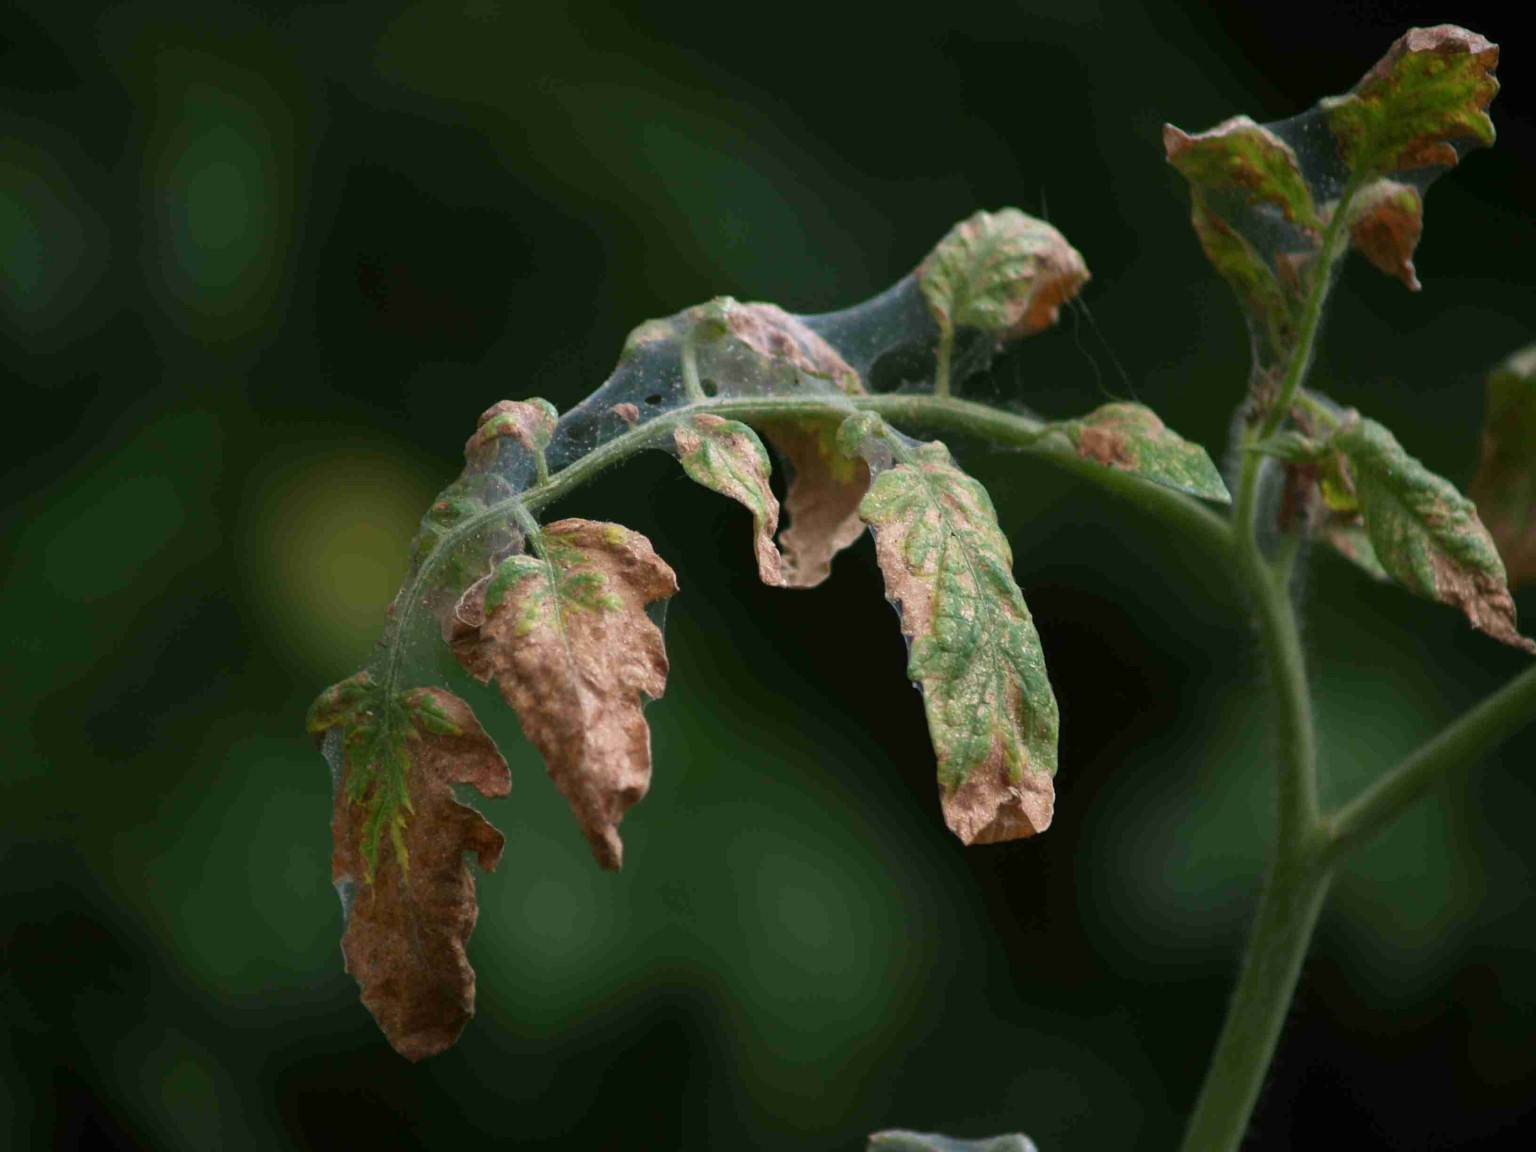 Лечение фузариозного увядания томатов